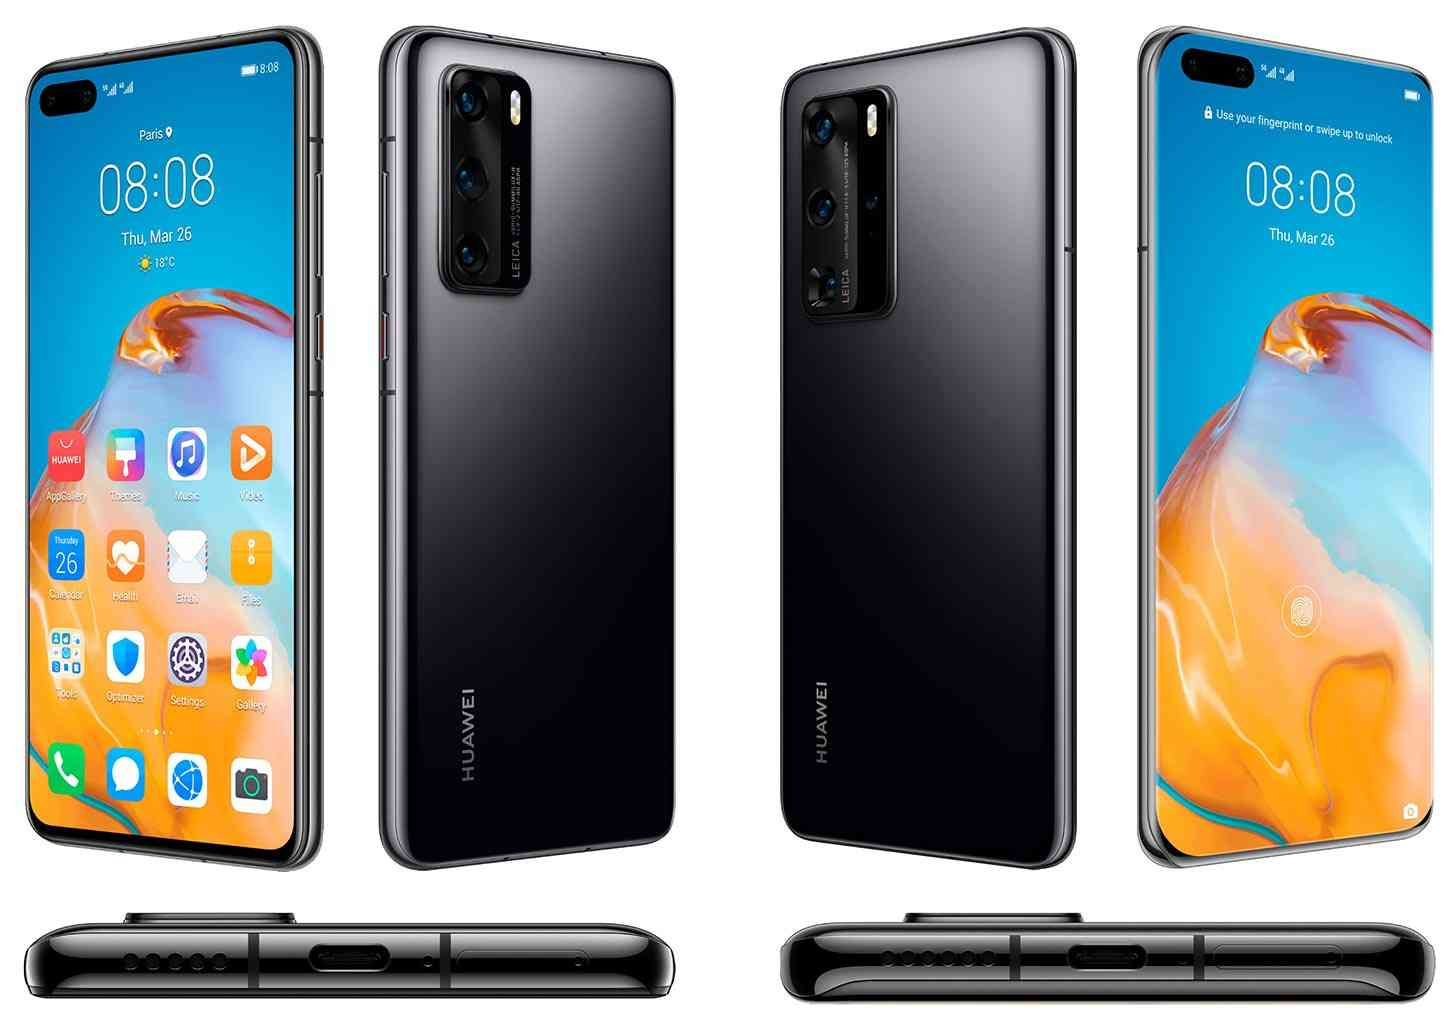 Huawei p smart - обзор, характеристики, цены, отзывы